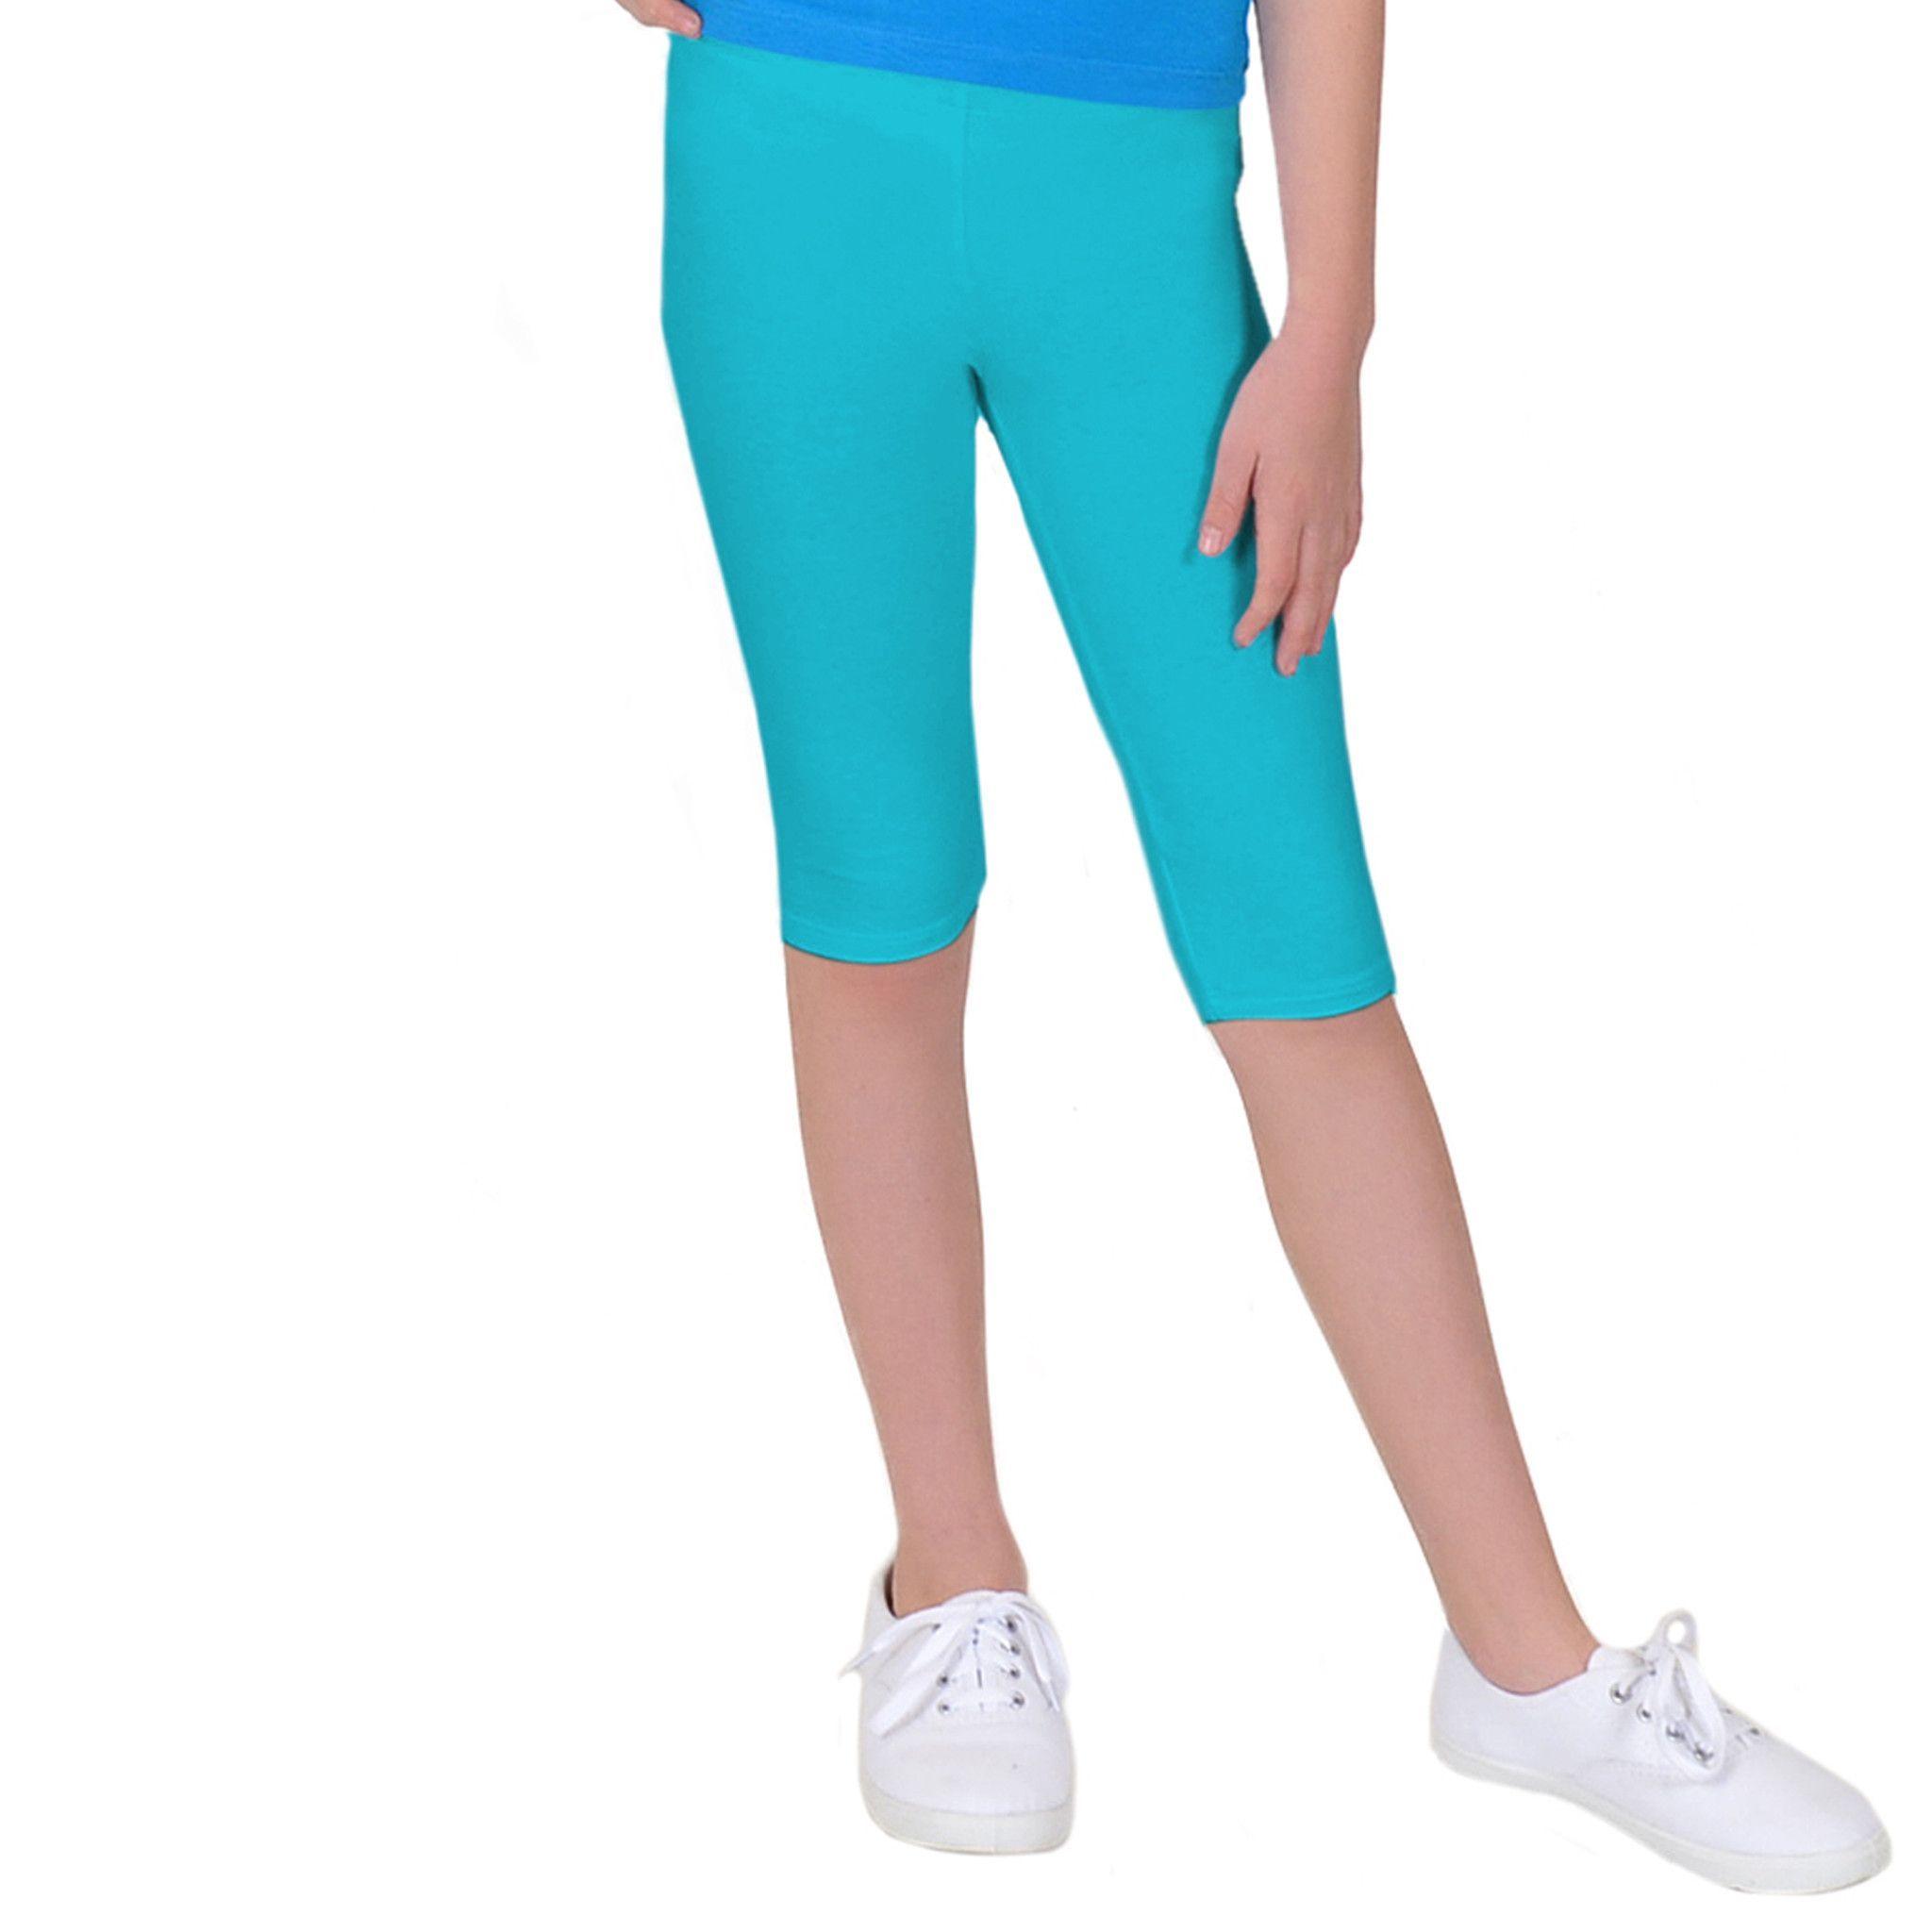 Teamwear Knee-Length Leggings